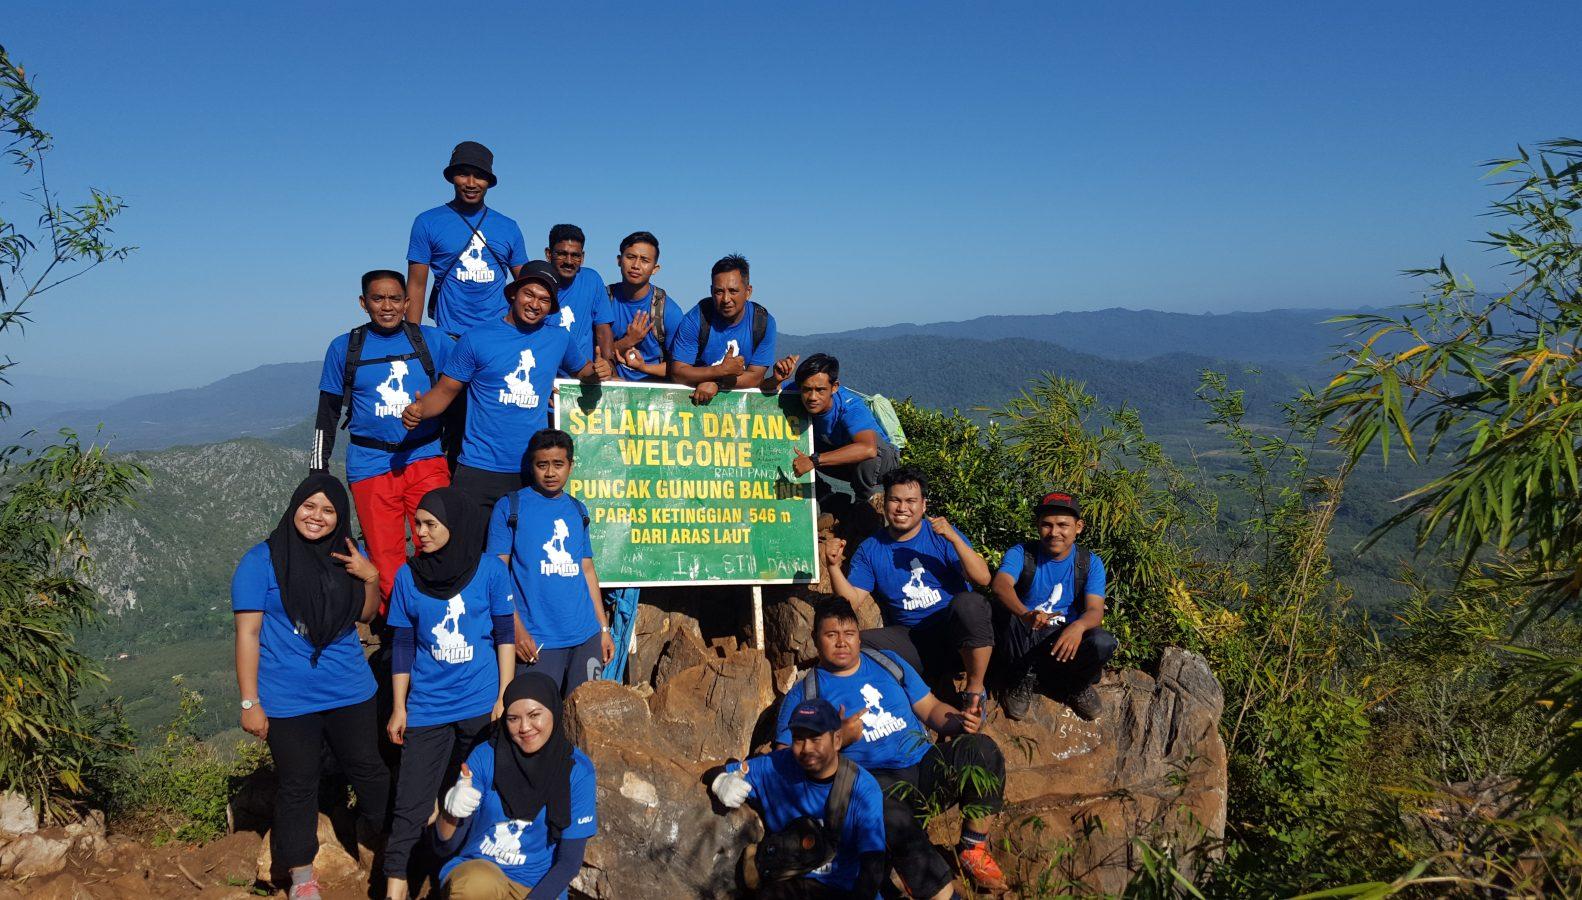 Ekspedisi Mendaki Di Gunung Baling, Kedah